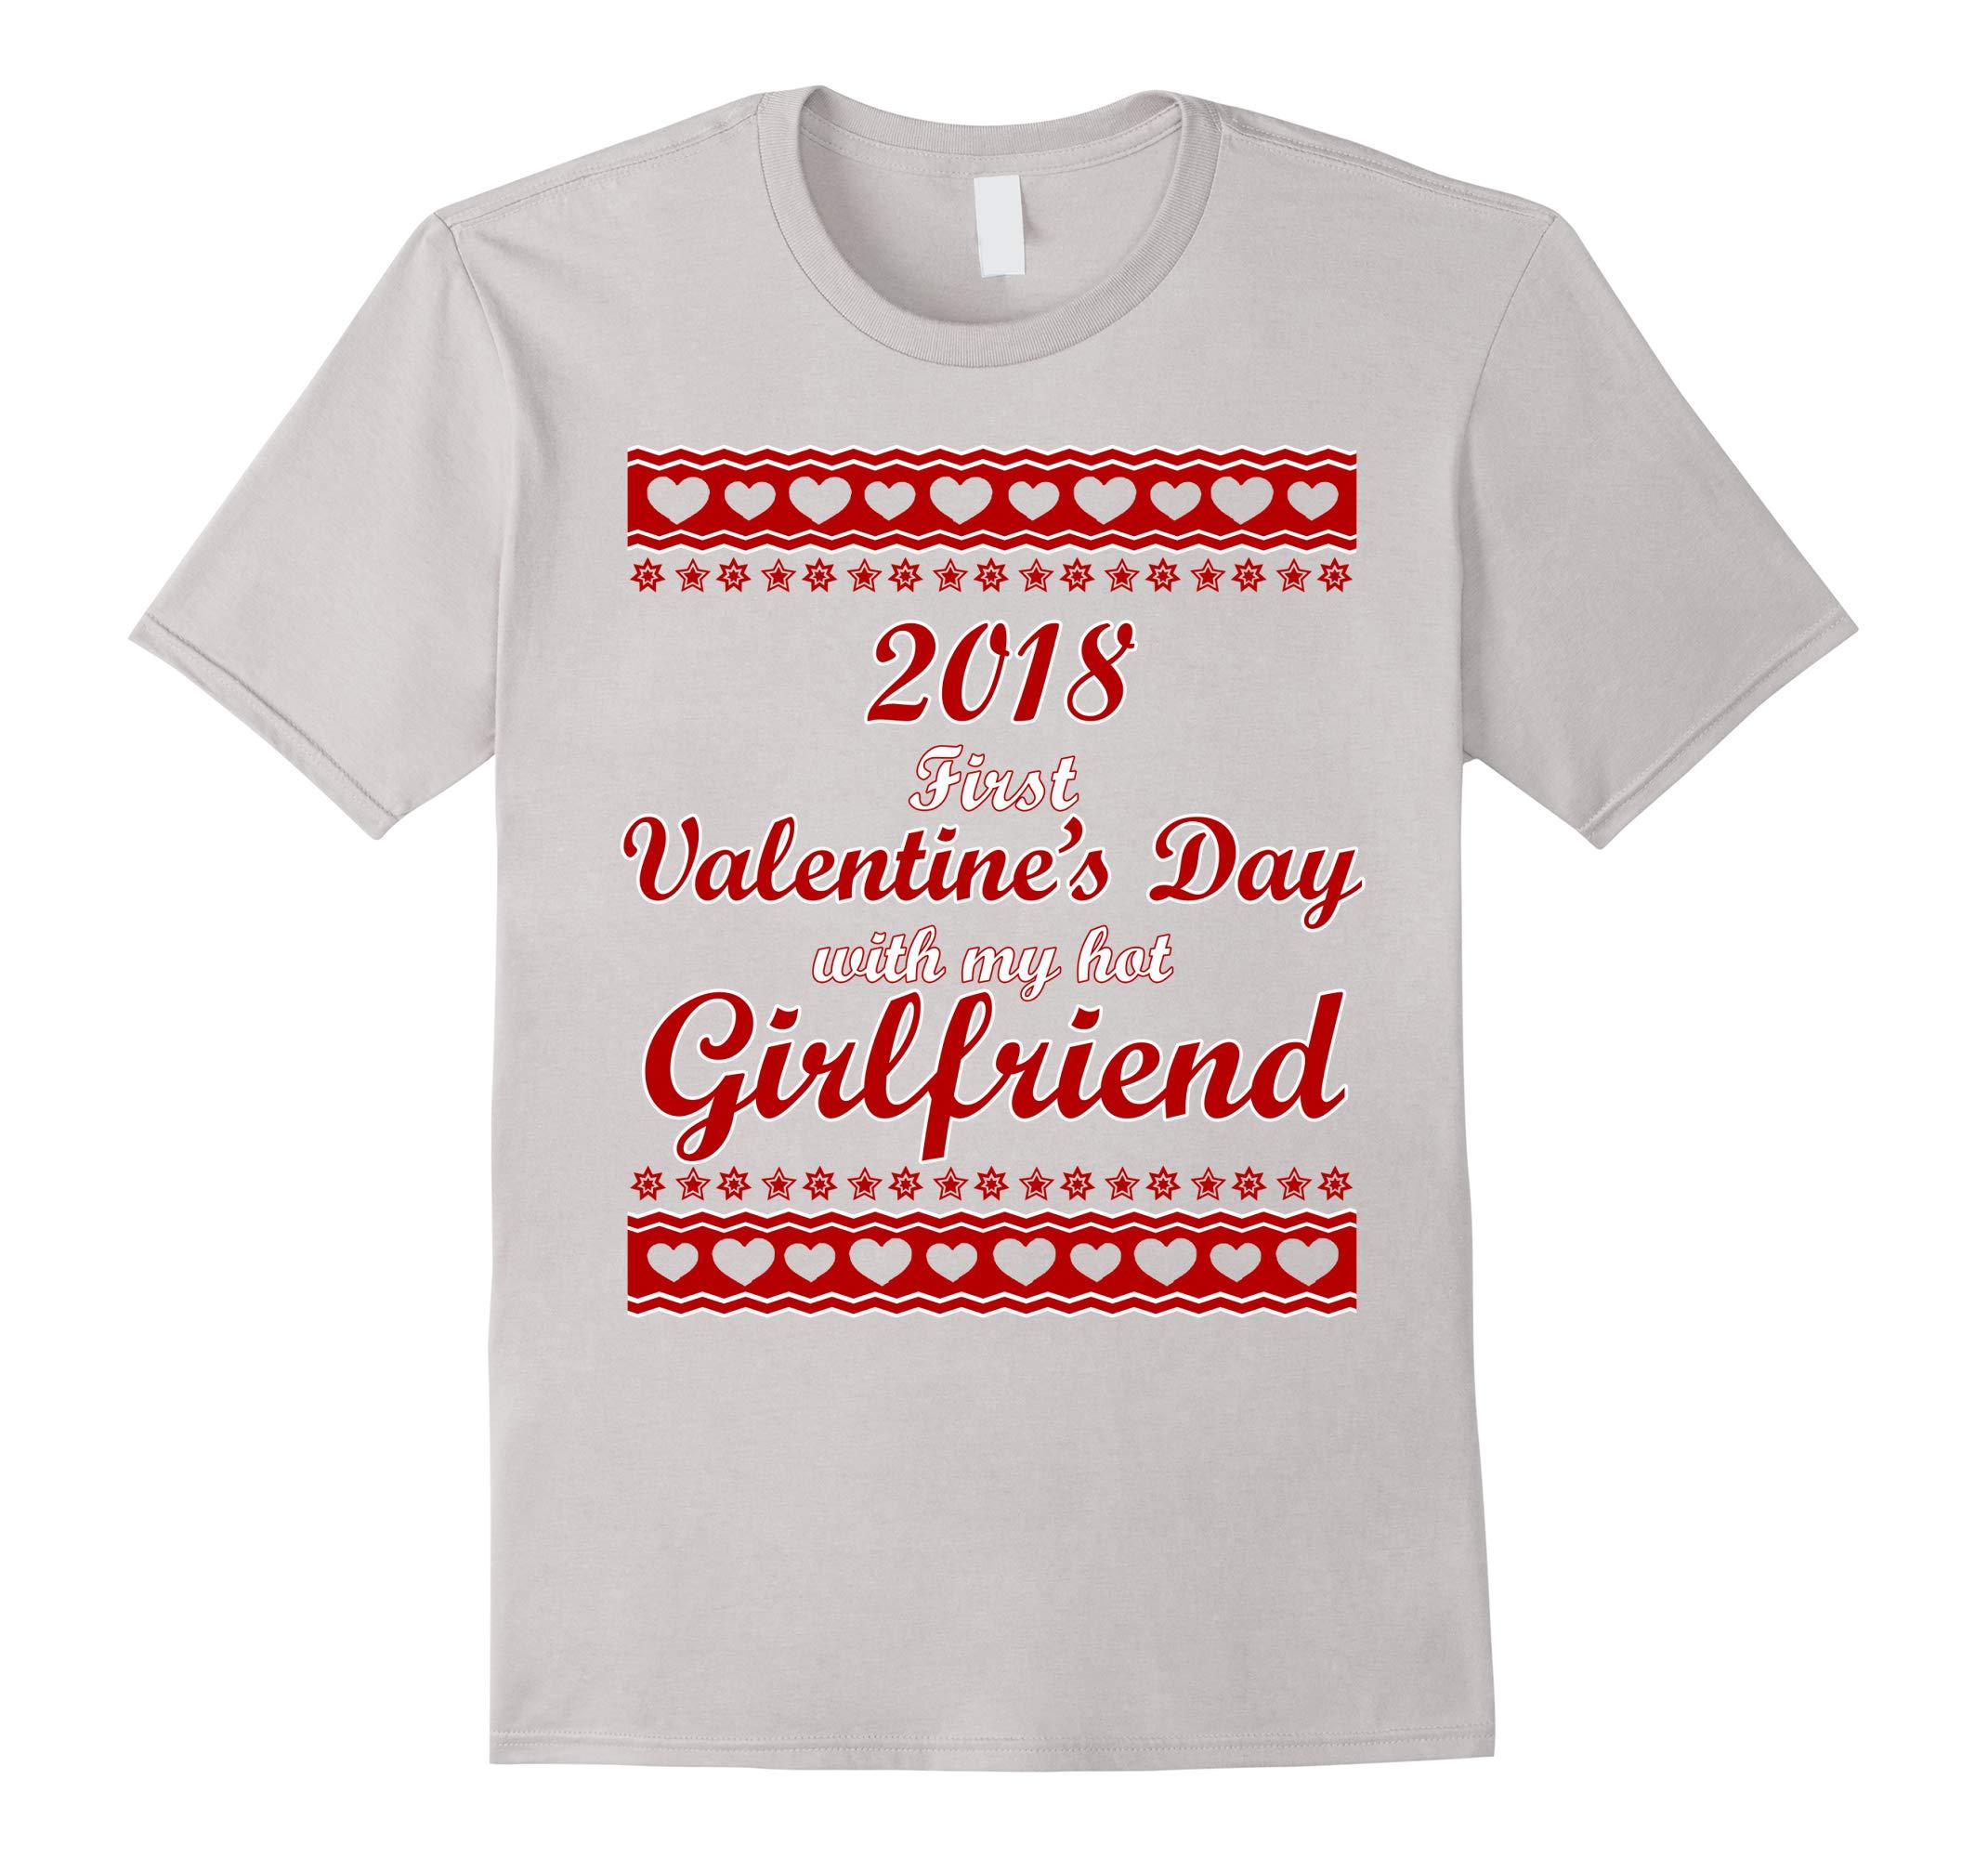 2018 First Valentine's Day with my Girlfriend-RT